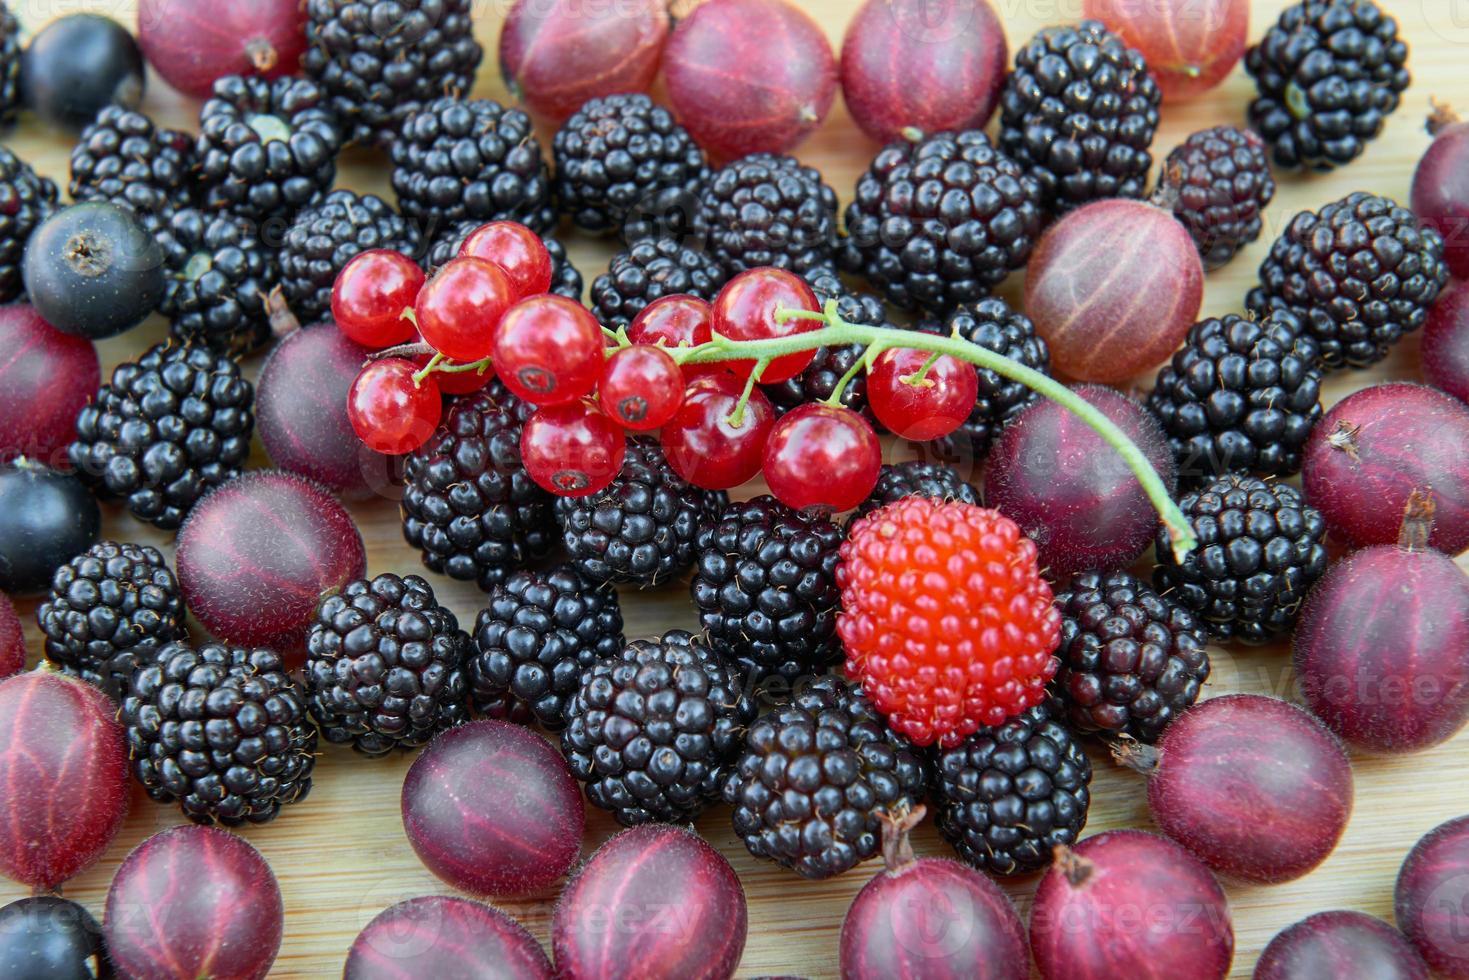 Blackberries, gooseberries, redcurrants, blackcurrants on a wooden table photo